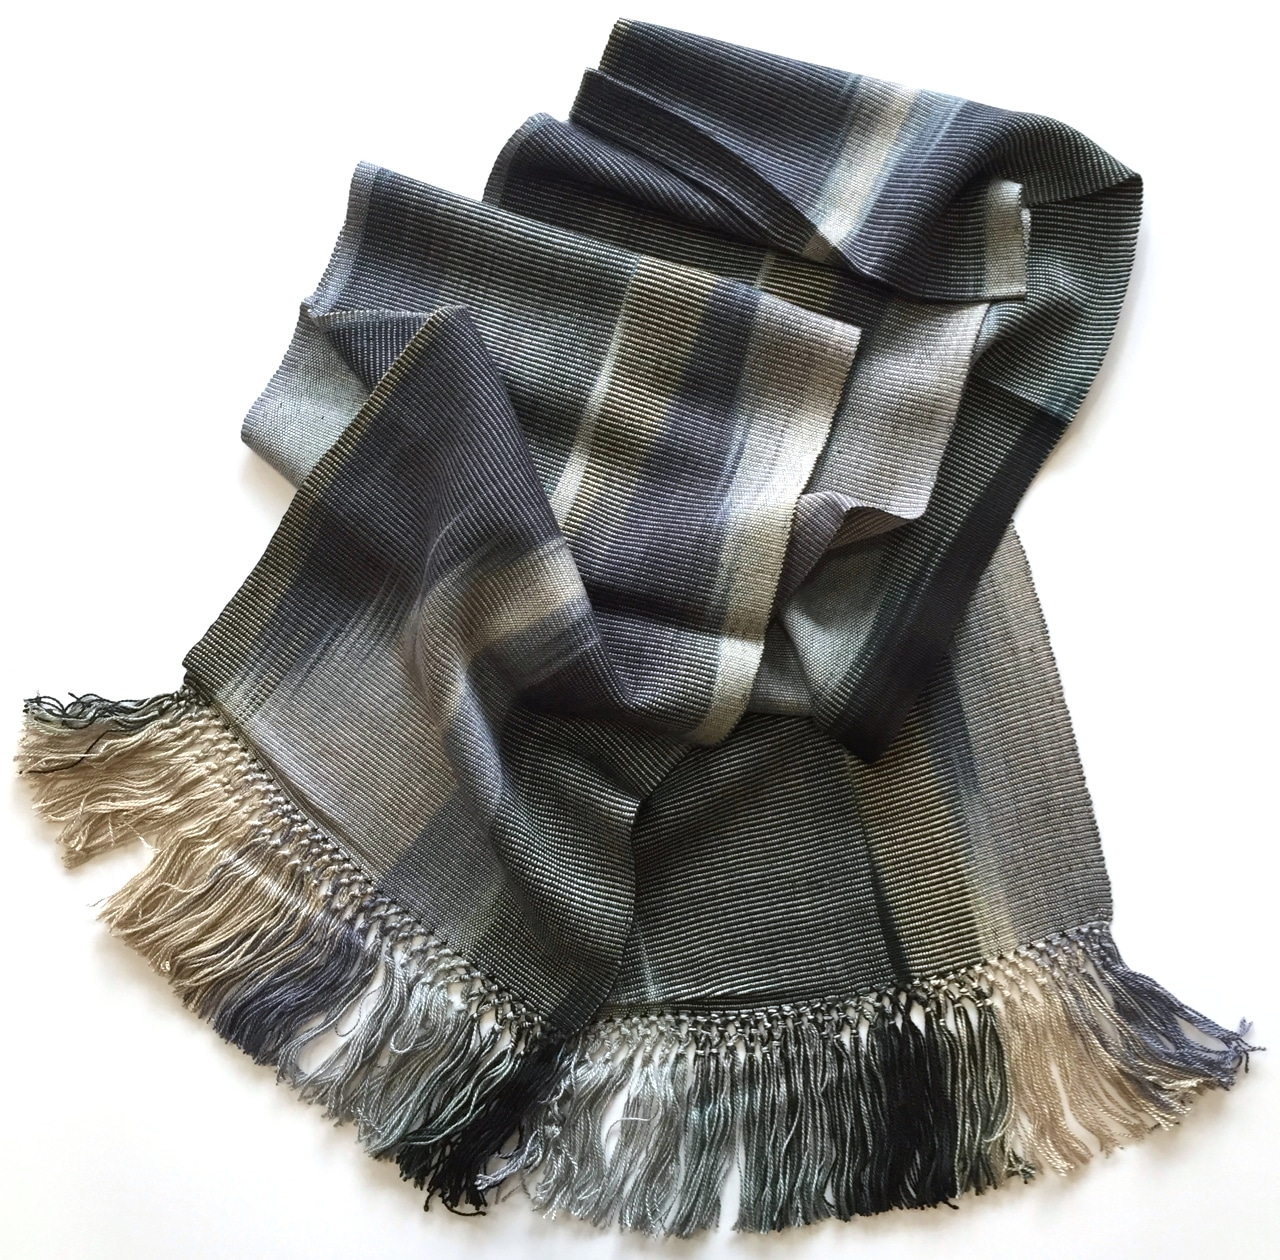 Black, Gray, Beige - Lightweight Bamboo Handwoven Scarf 8 x 68